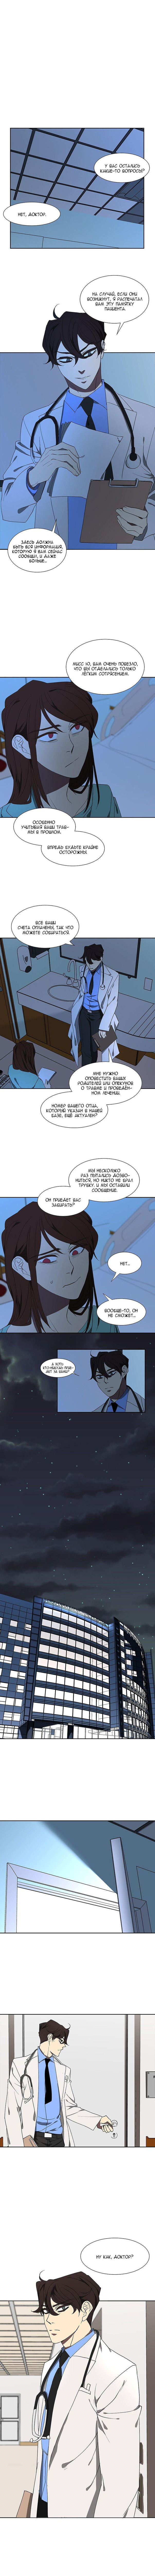 Манга Я люблю Ю / I love Yoo  - Том 1 Глава 67 Страница 2